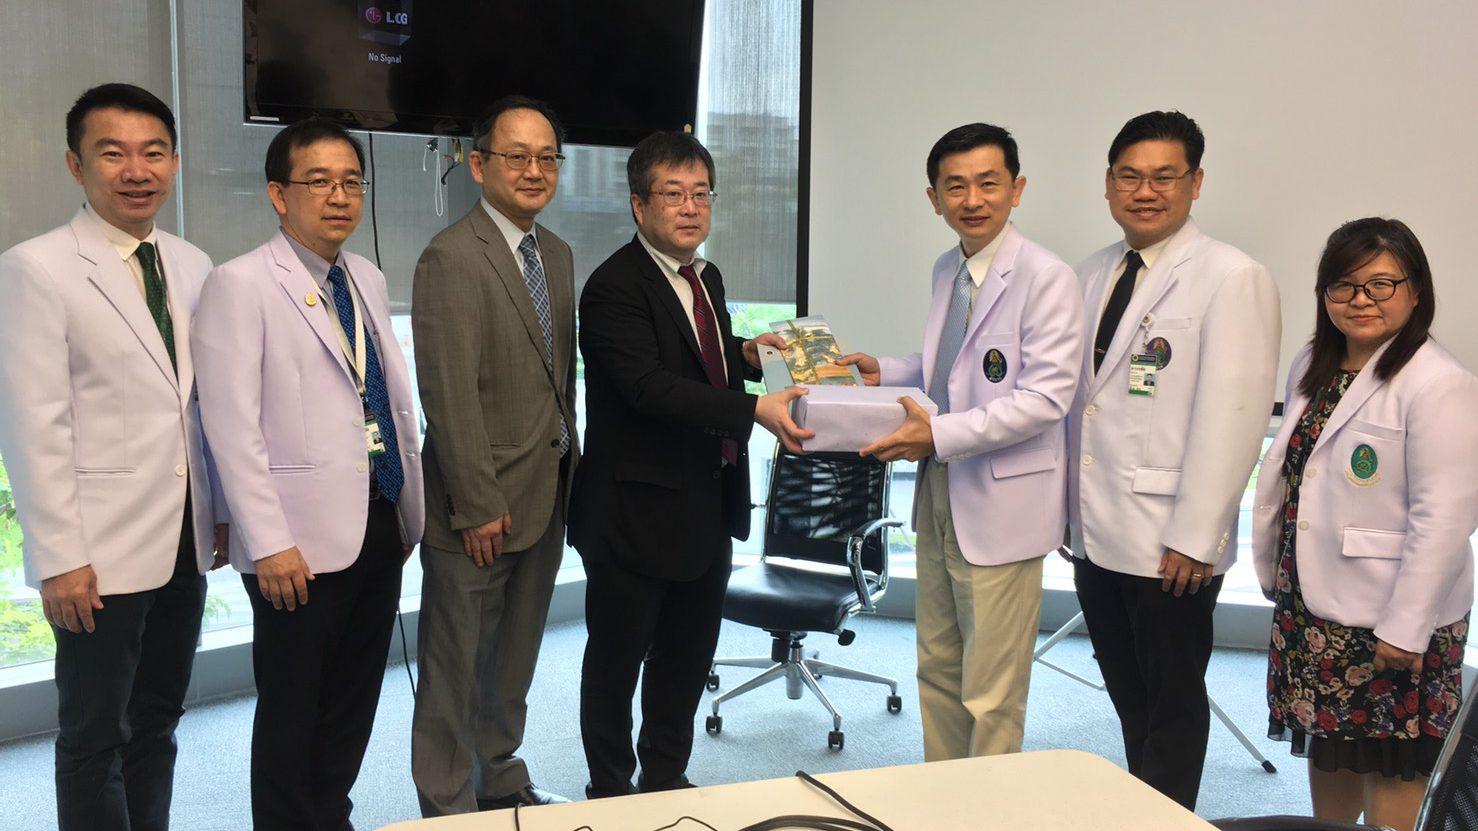 Delegates from School of Medicine Kobe University Visited Siriraj